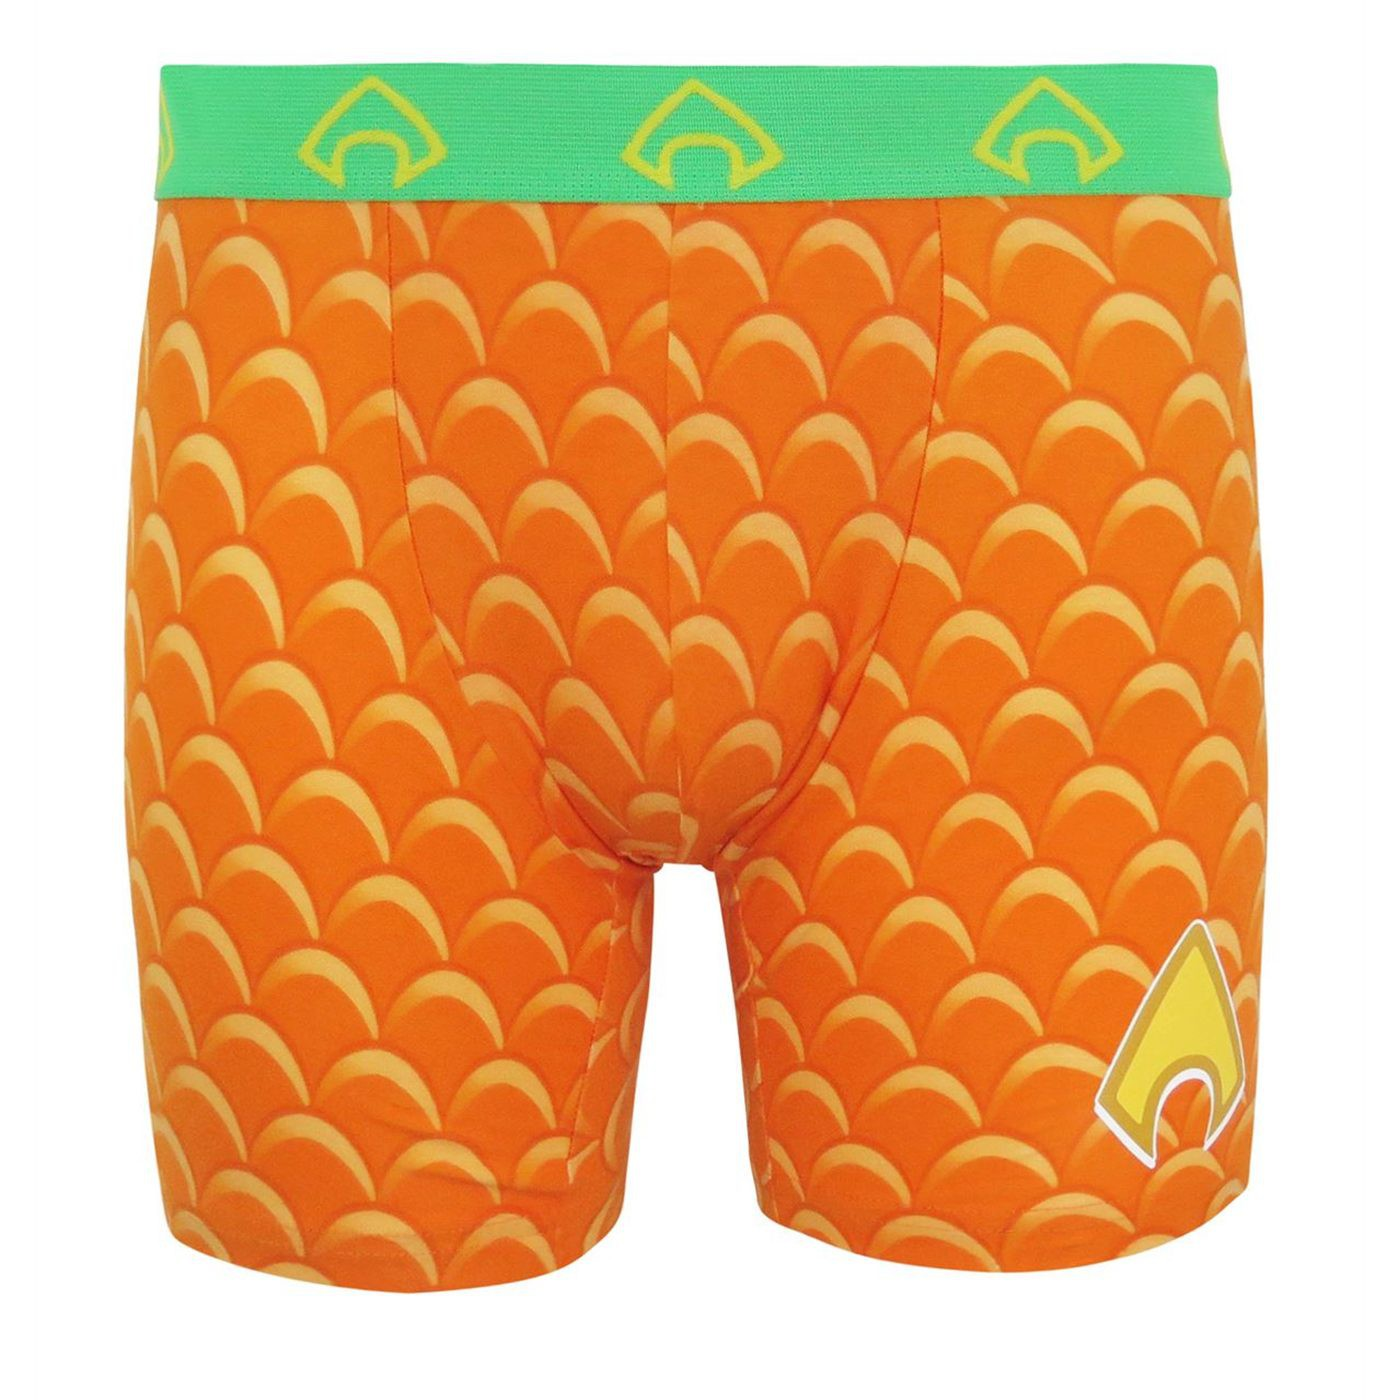 Aquaman Symbol Men's Underwear Fashion Boxer Briefs